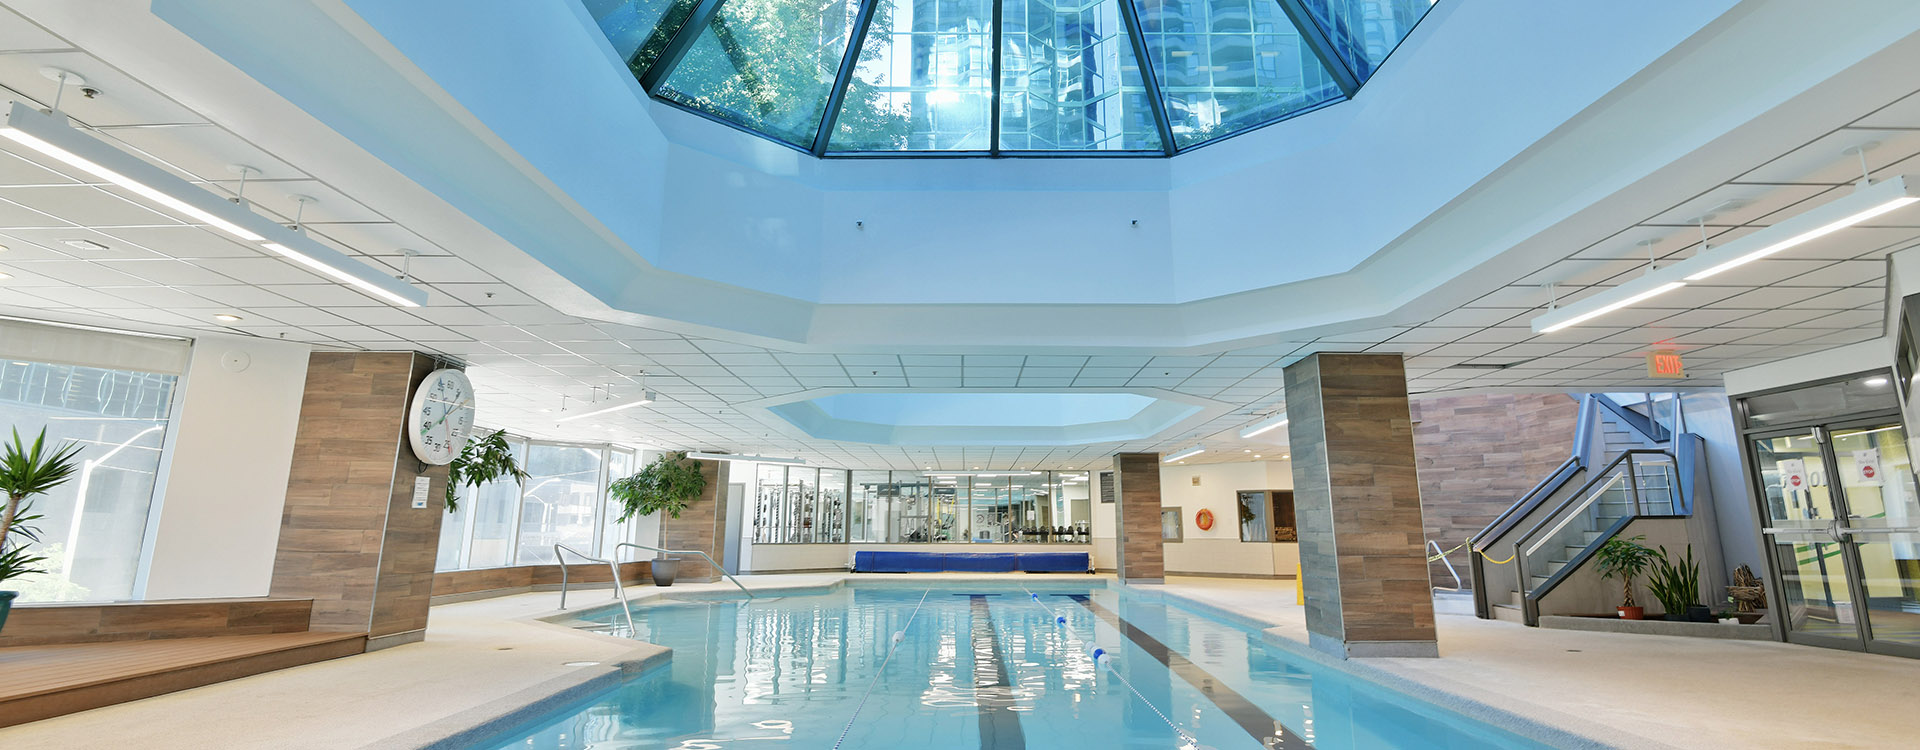 one80five-185-lyon-street-north-ottawa-pool